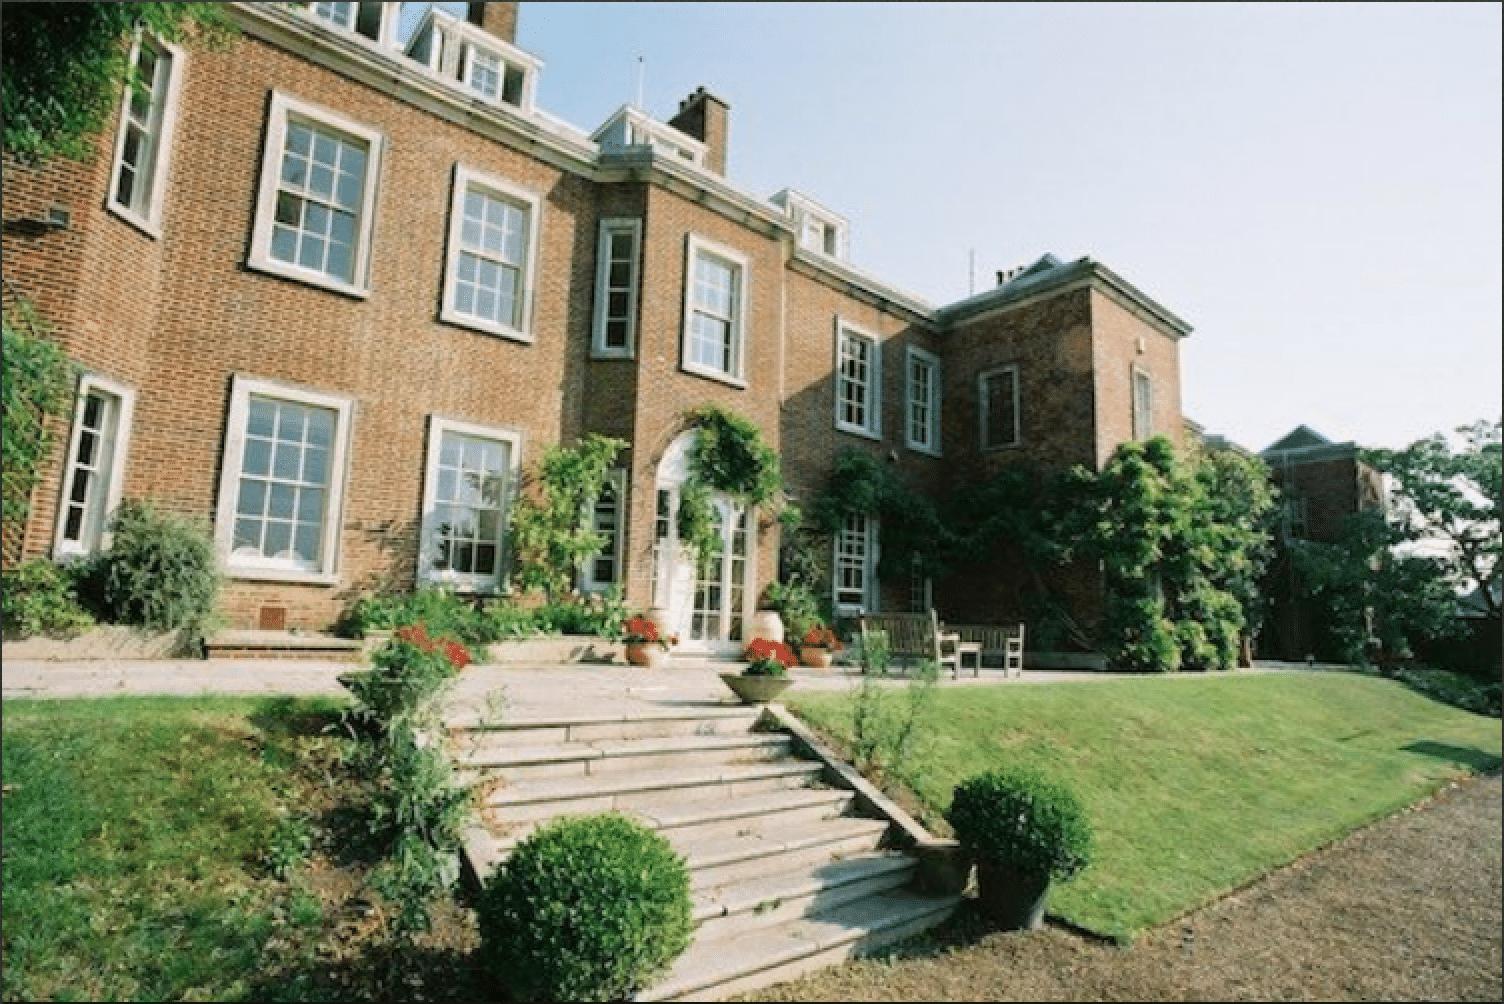 The Garden at Pelham House - Lewes Restaurants